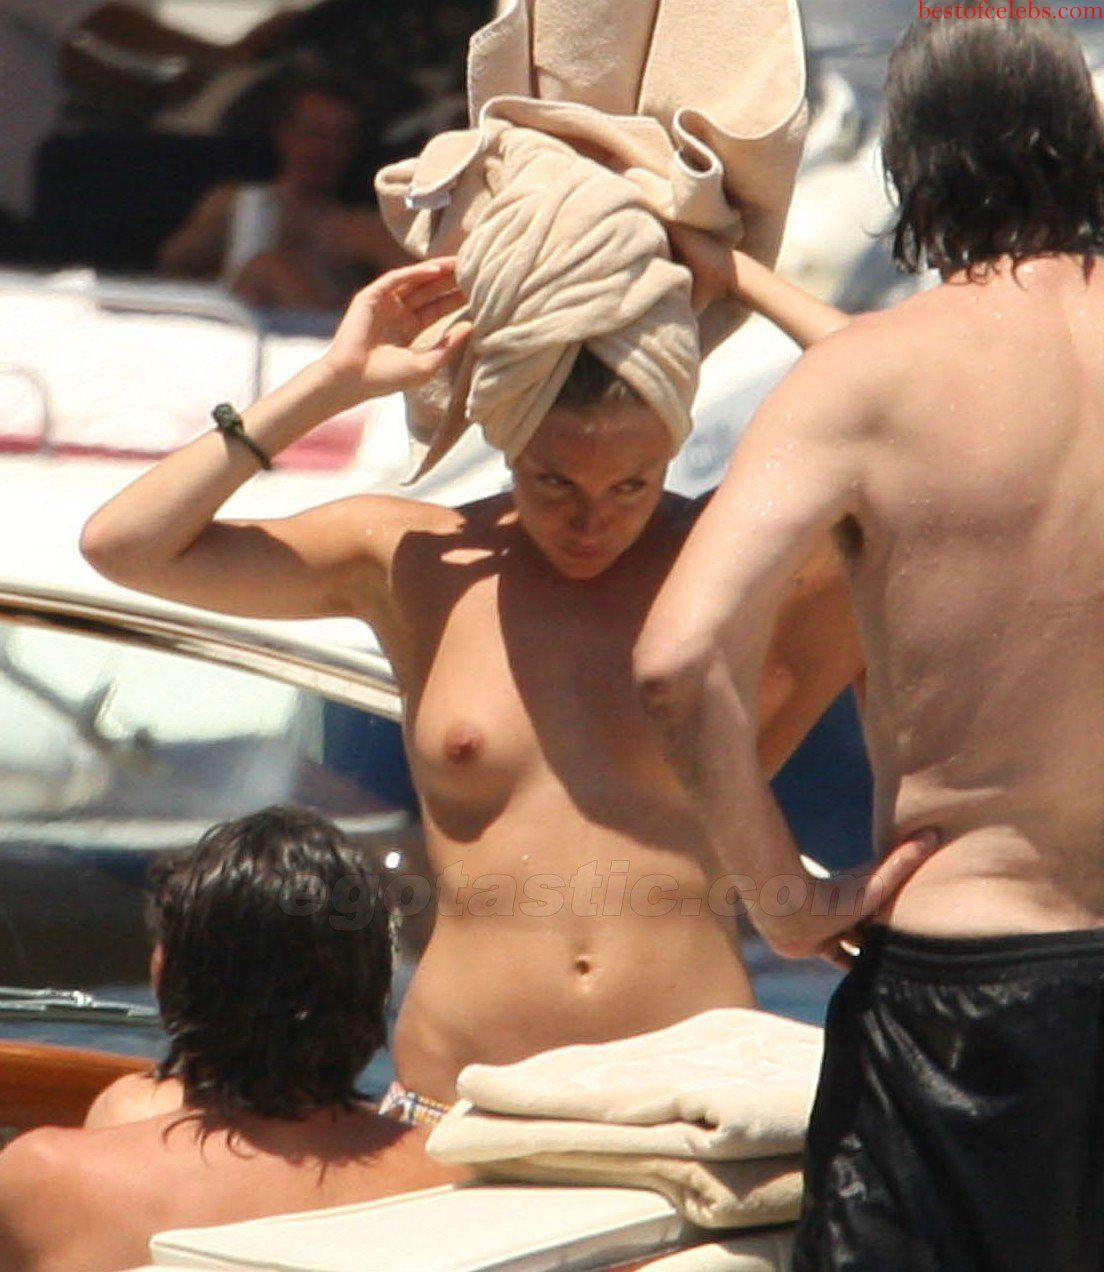 http://1.bp.blogspot.com/-m9_NkAC5kk8/T_qUWjqwLrI/AAAAAAAAF4w/RbfCJPkD7a0/s1600/sienna-Miller-caught-topless-on-yacht-004.jpg